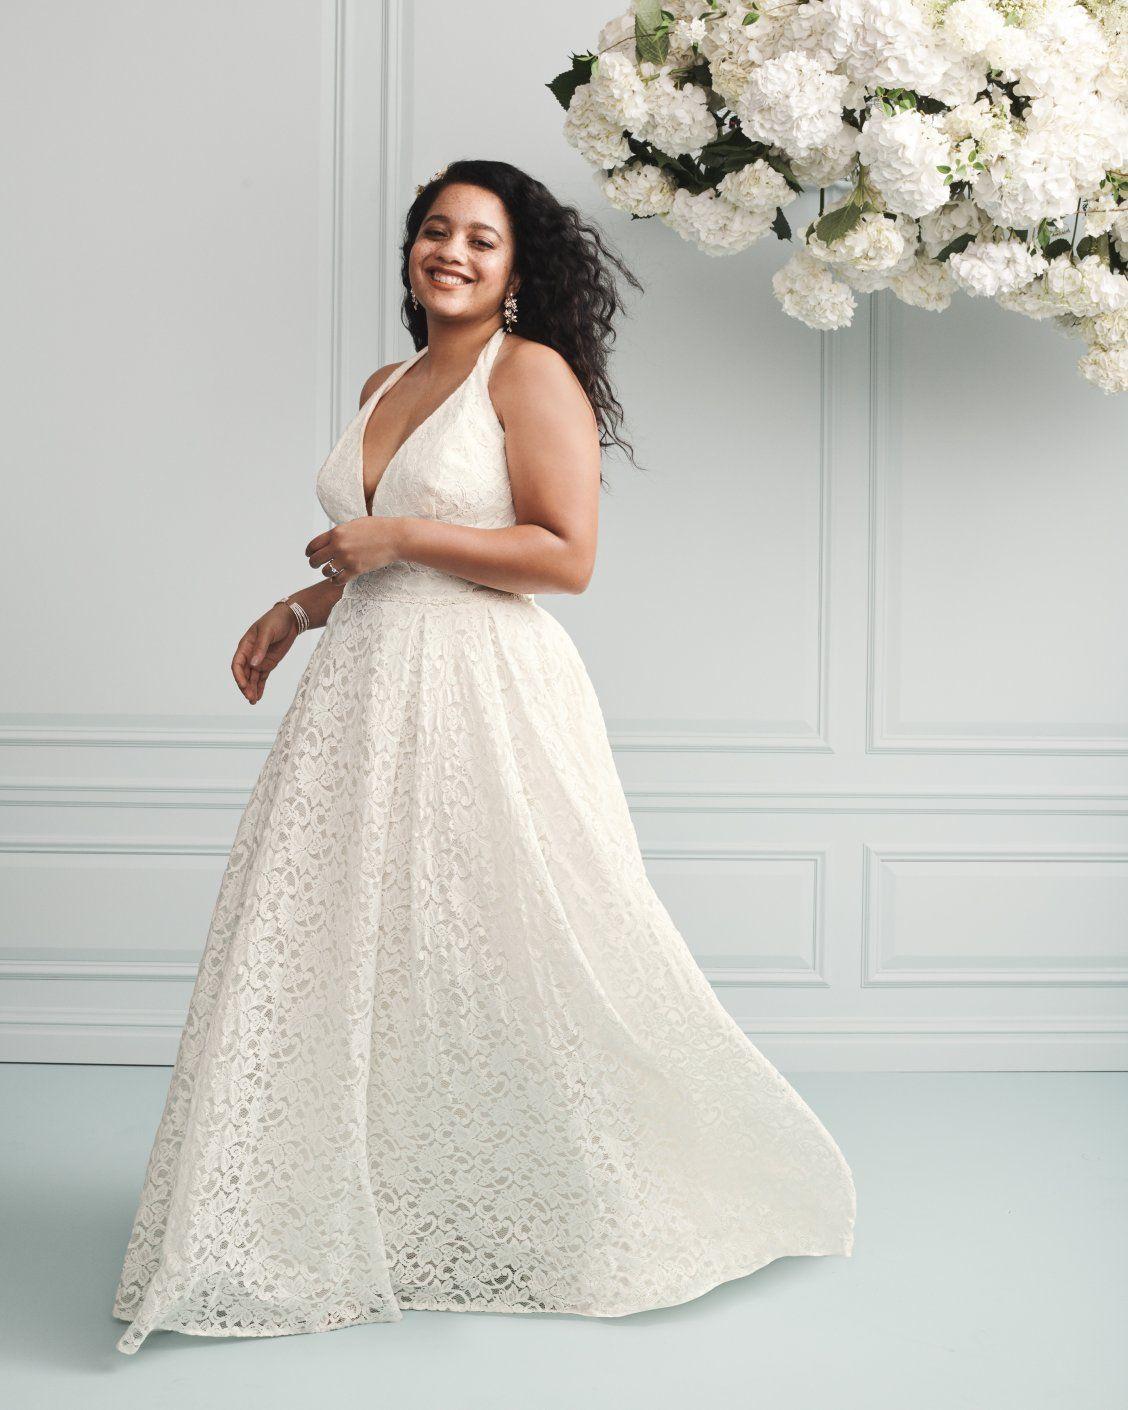 Plunging Lace Halter Plus Size Wedding Dress David S Bridal Davids Bridal Wedding Dresses Plus Size Wedding Wedding Dresses [ 1410 x 1128 Pixel ]